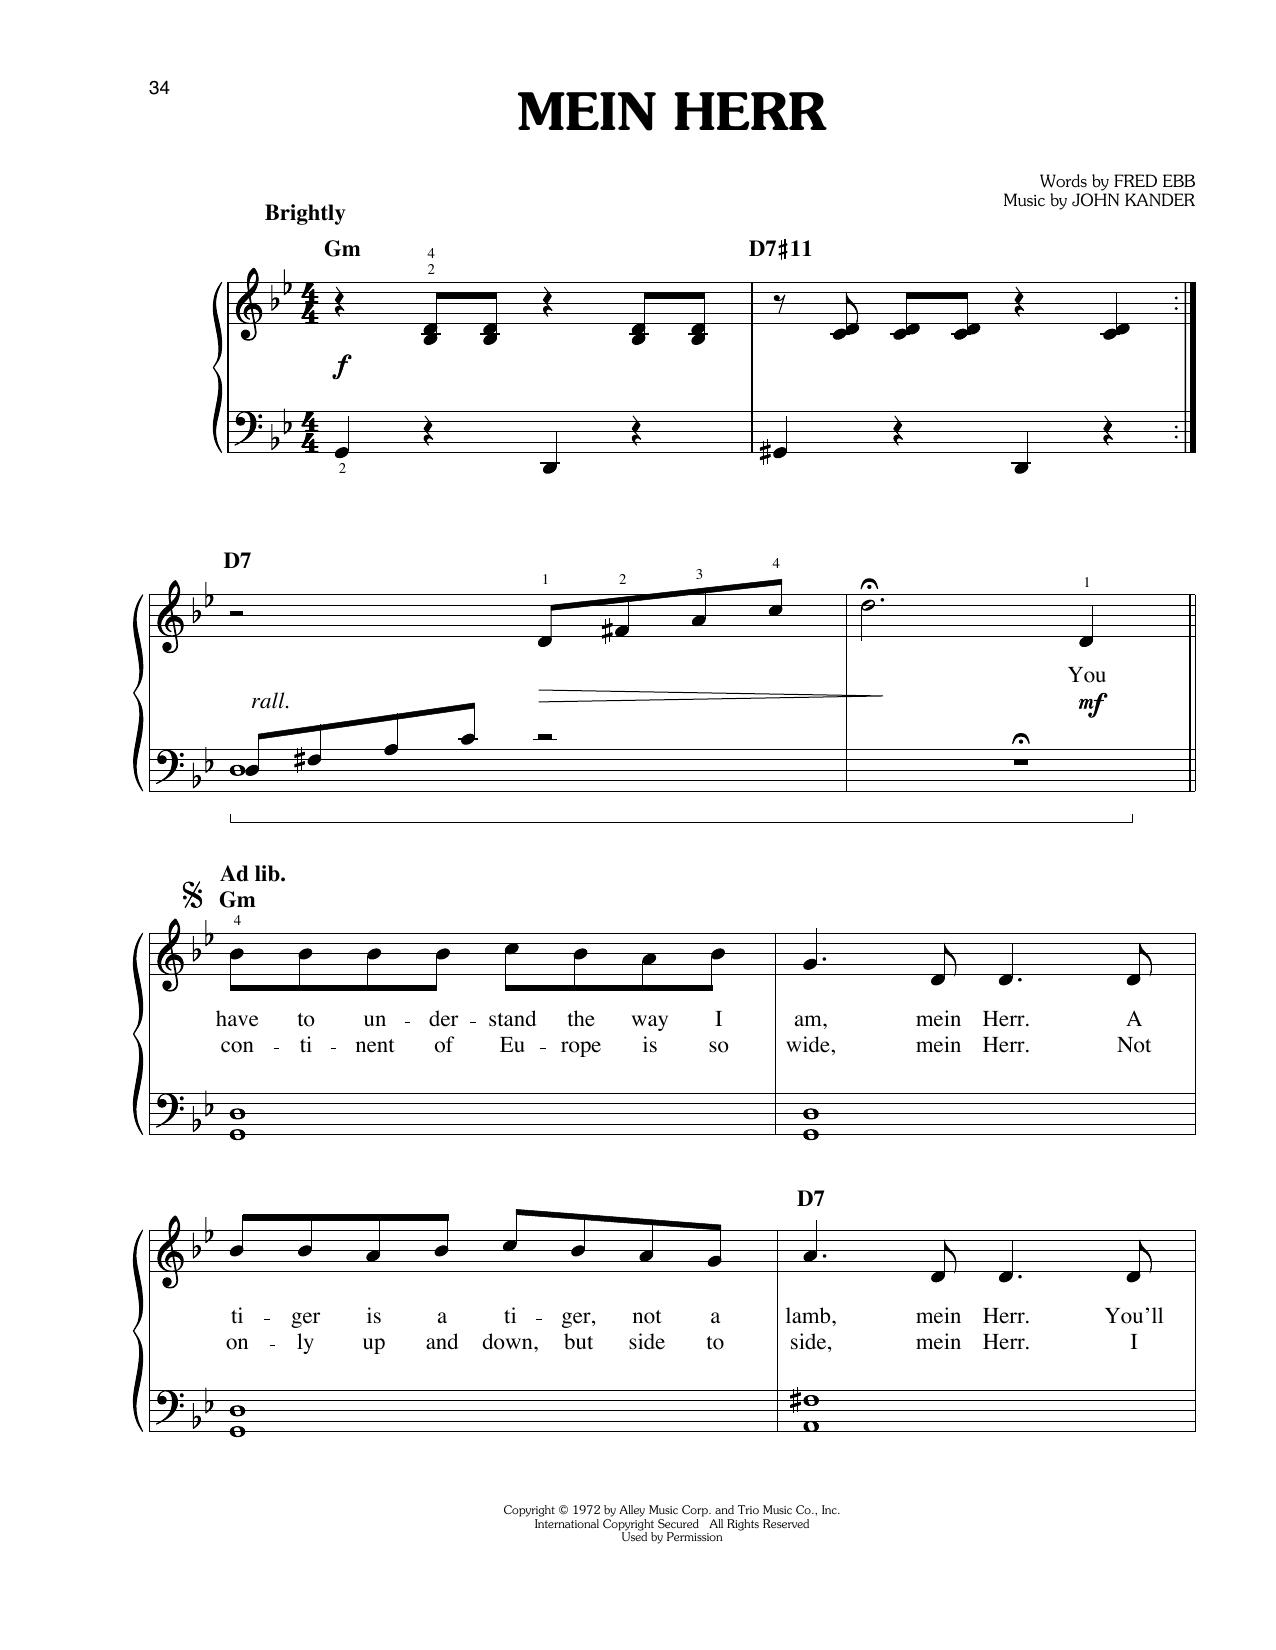 John Kander Mein Herr sheet music notes and chords